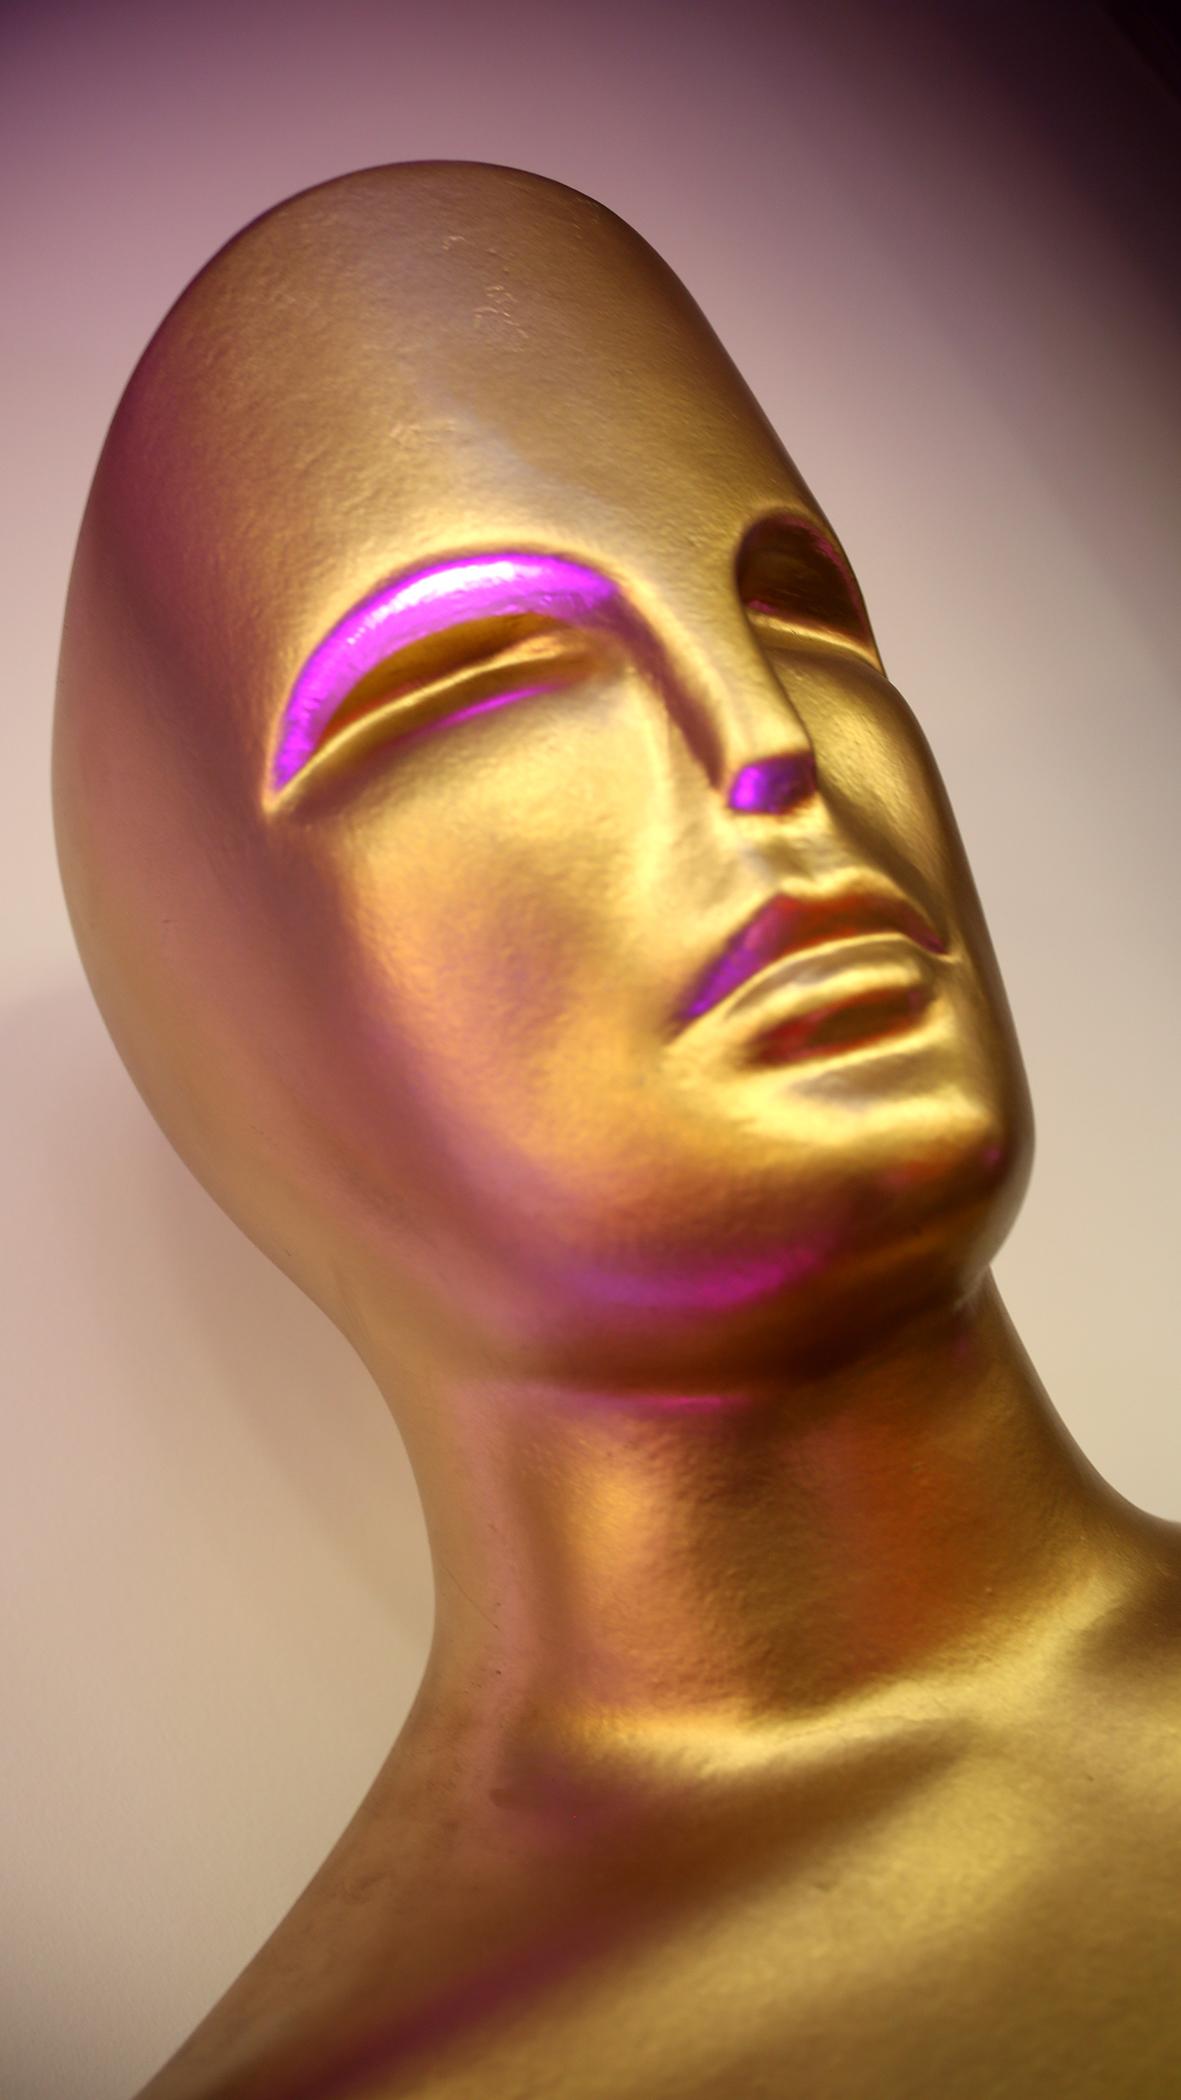 Life Size Oscar Statue